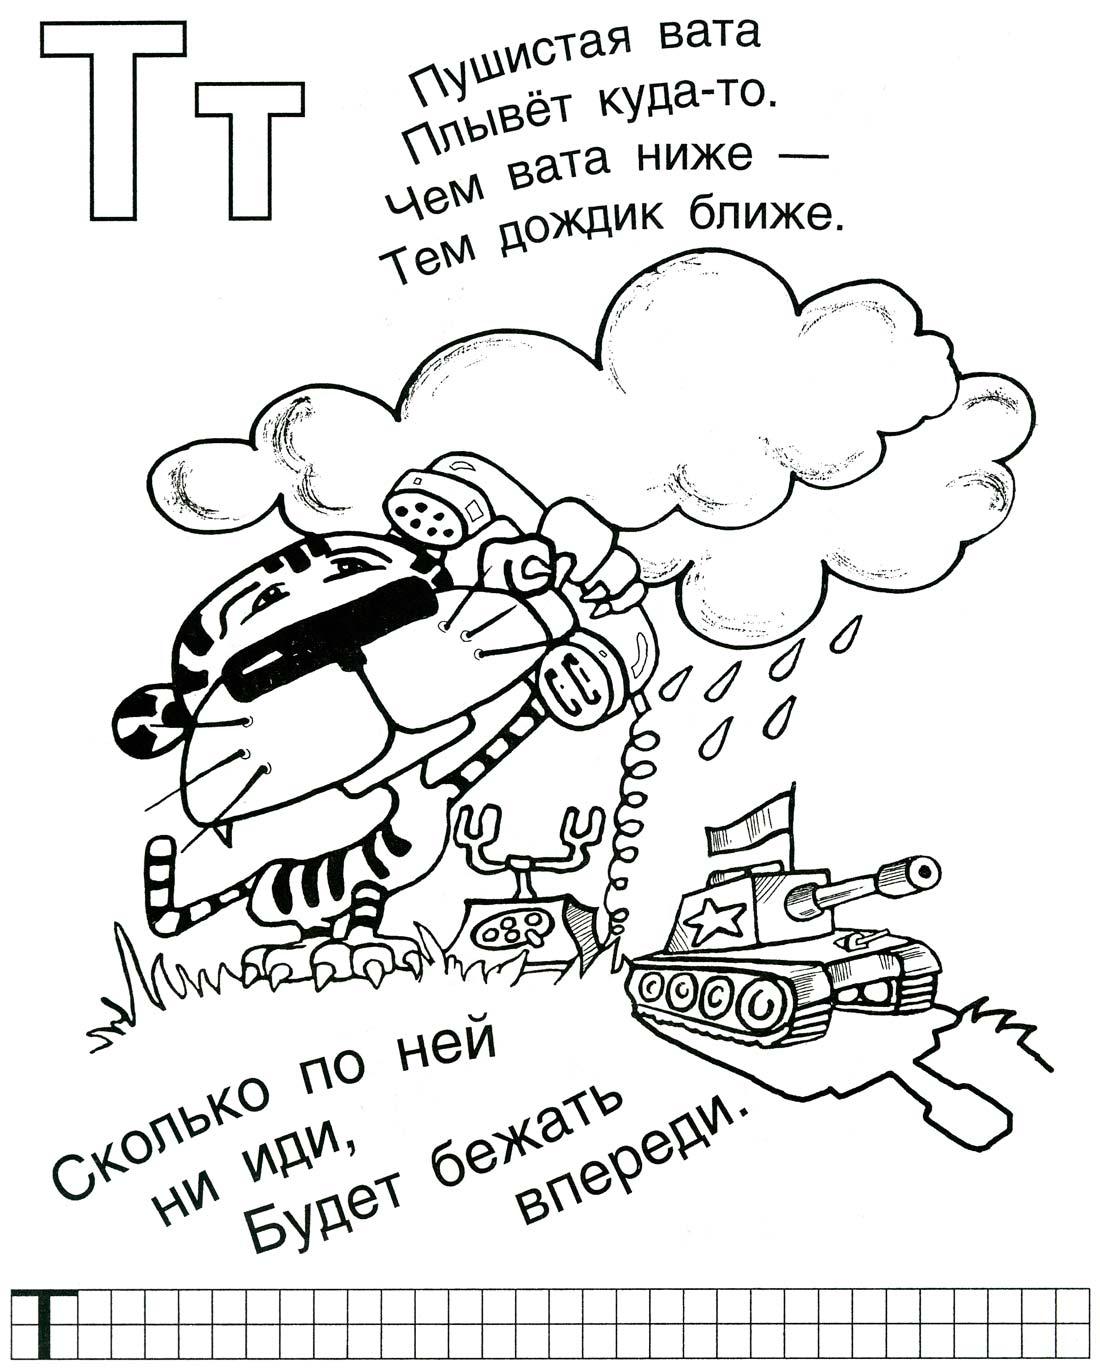 Азбука для детей в картинках: http://www.alegri.ru/deti/vospitanie-i-razvitie-rebenka/azbuka-dlja-detei-v-kartinkah/page-2.html